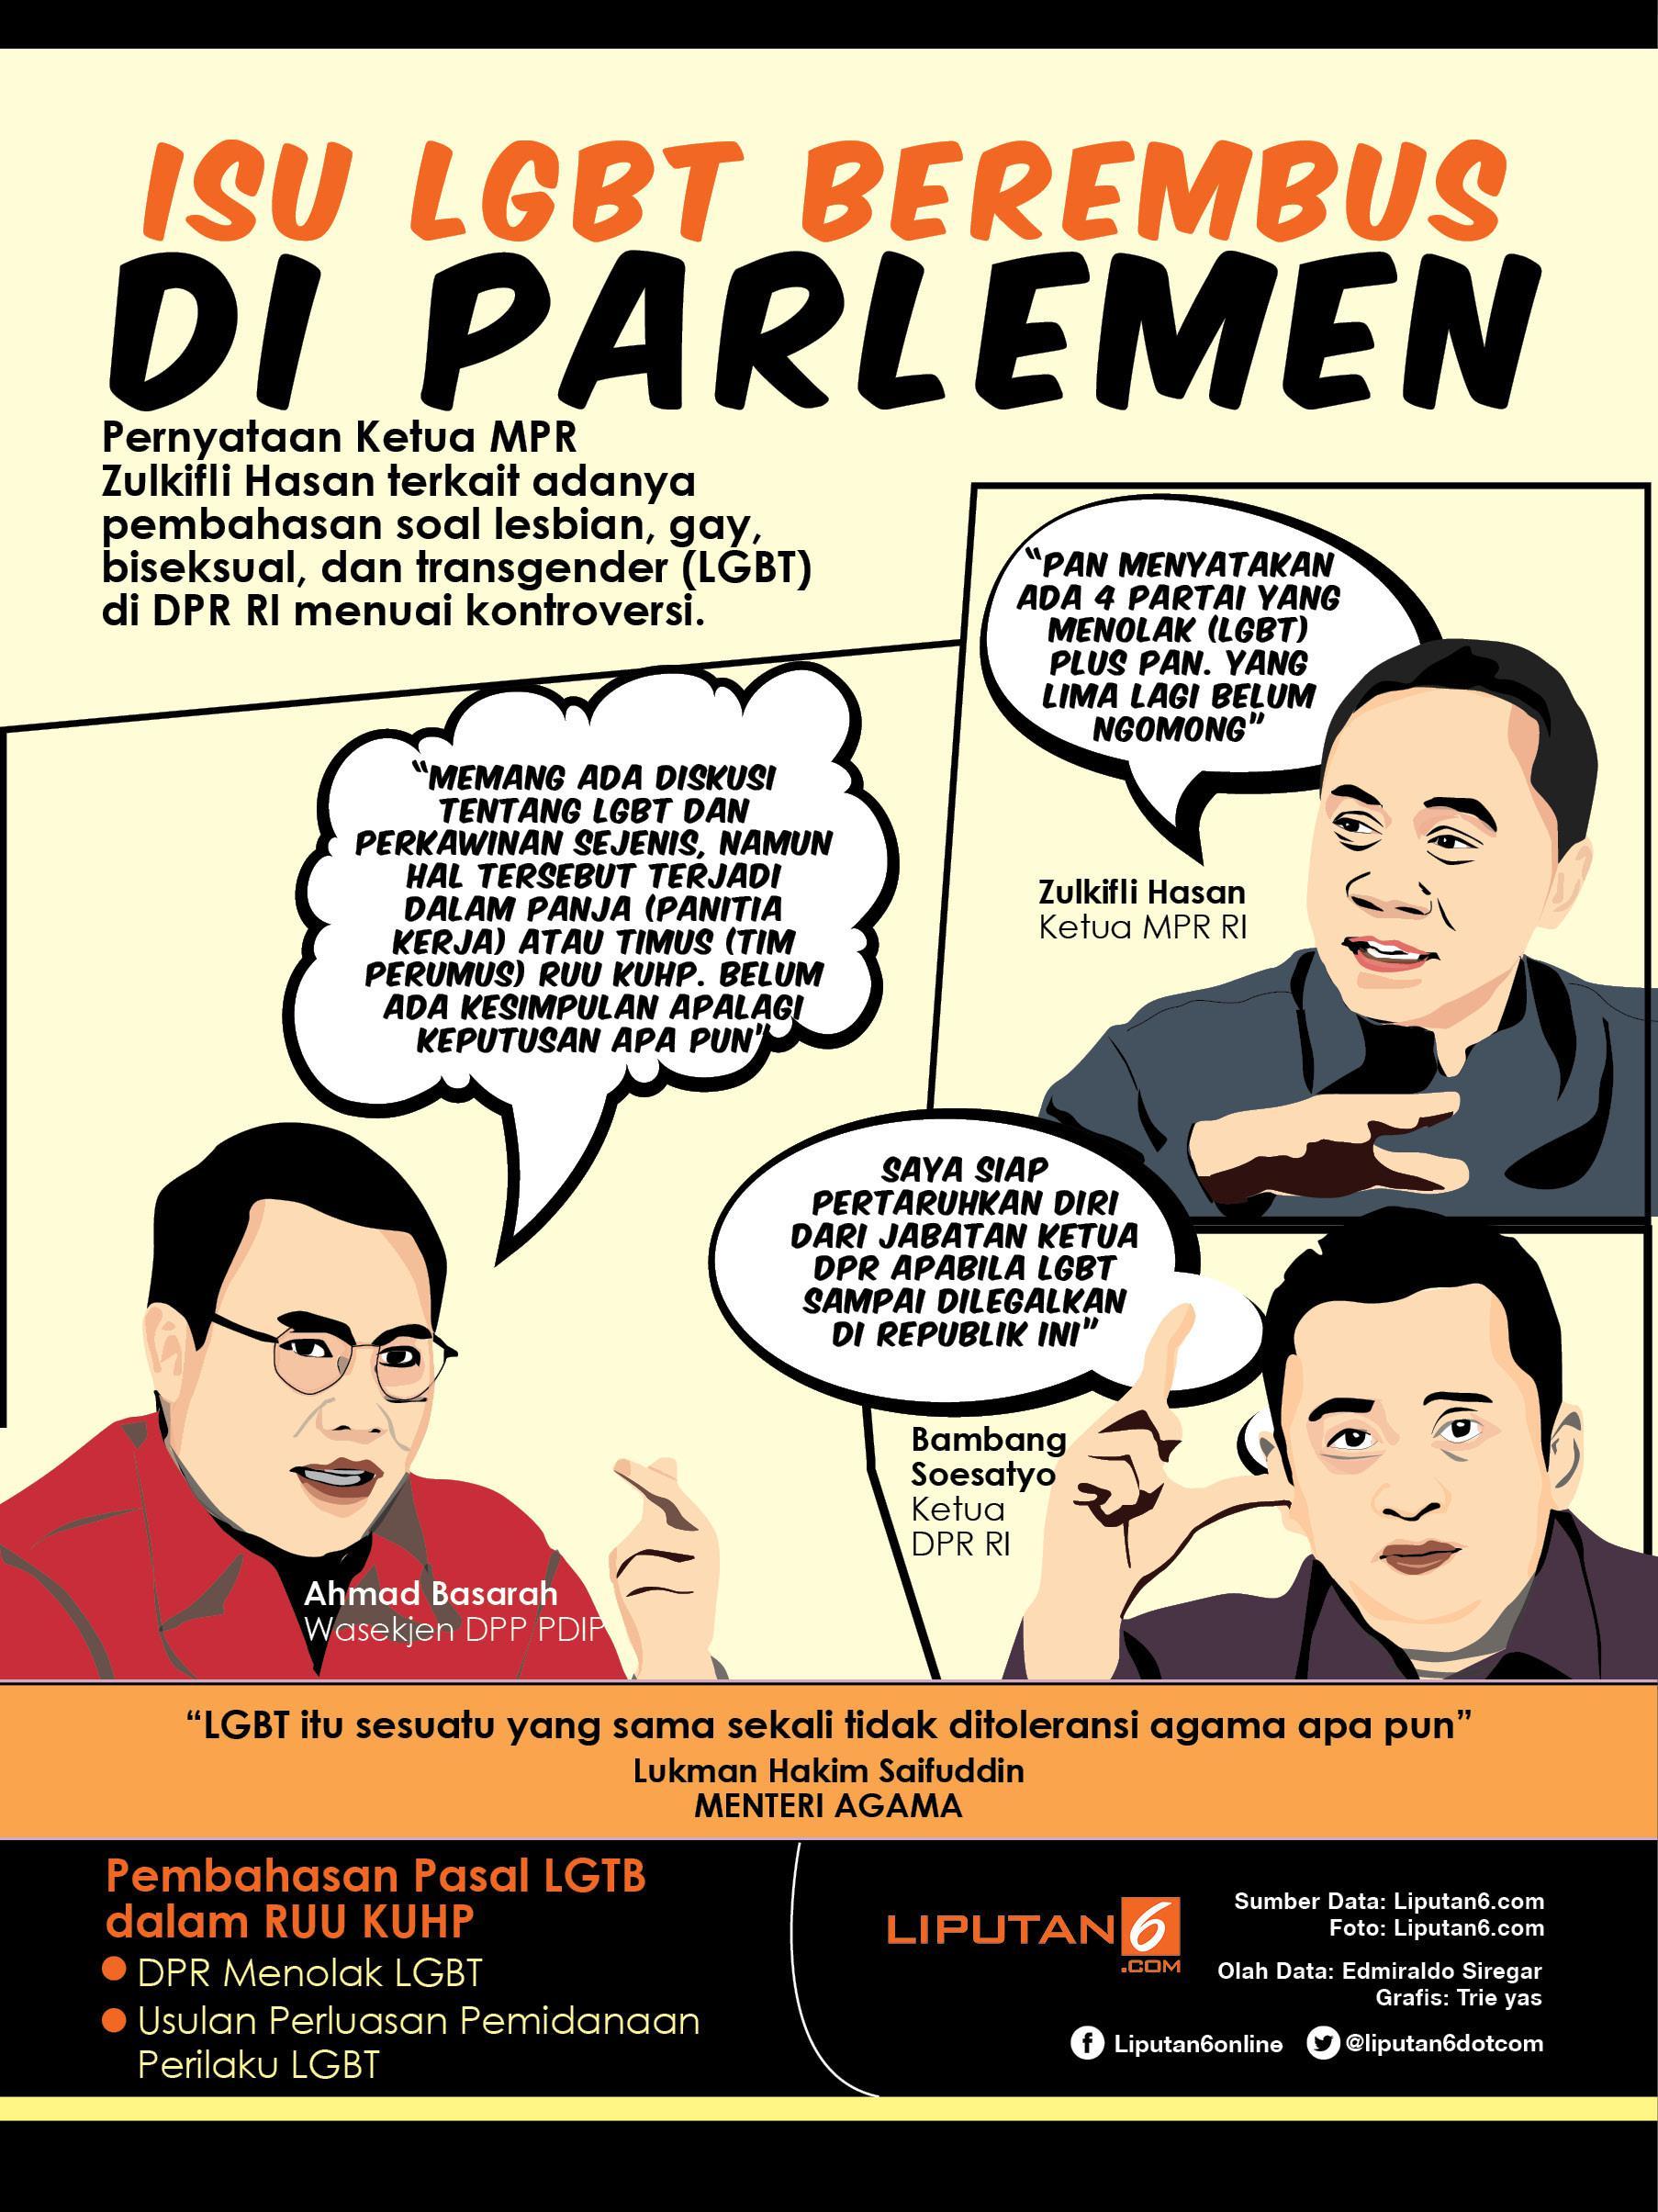 Infografis Isu LGBT Berhembus di Parlemen